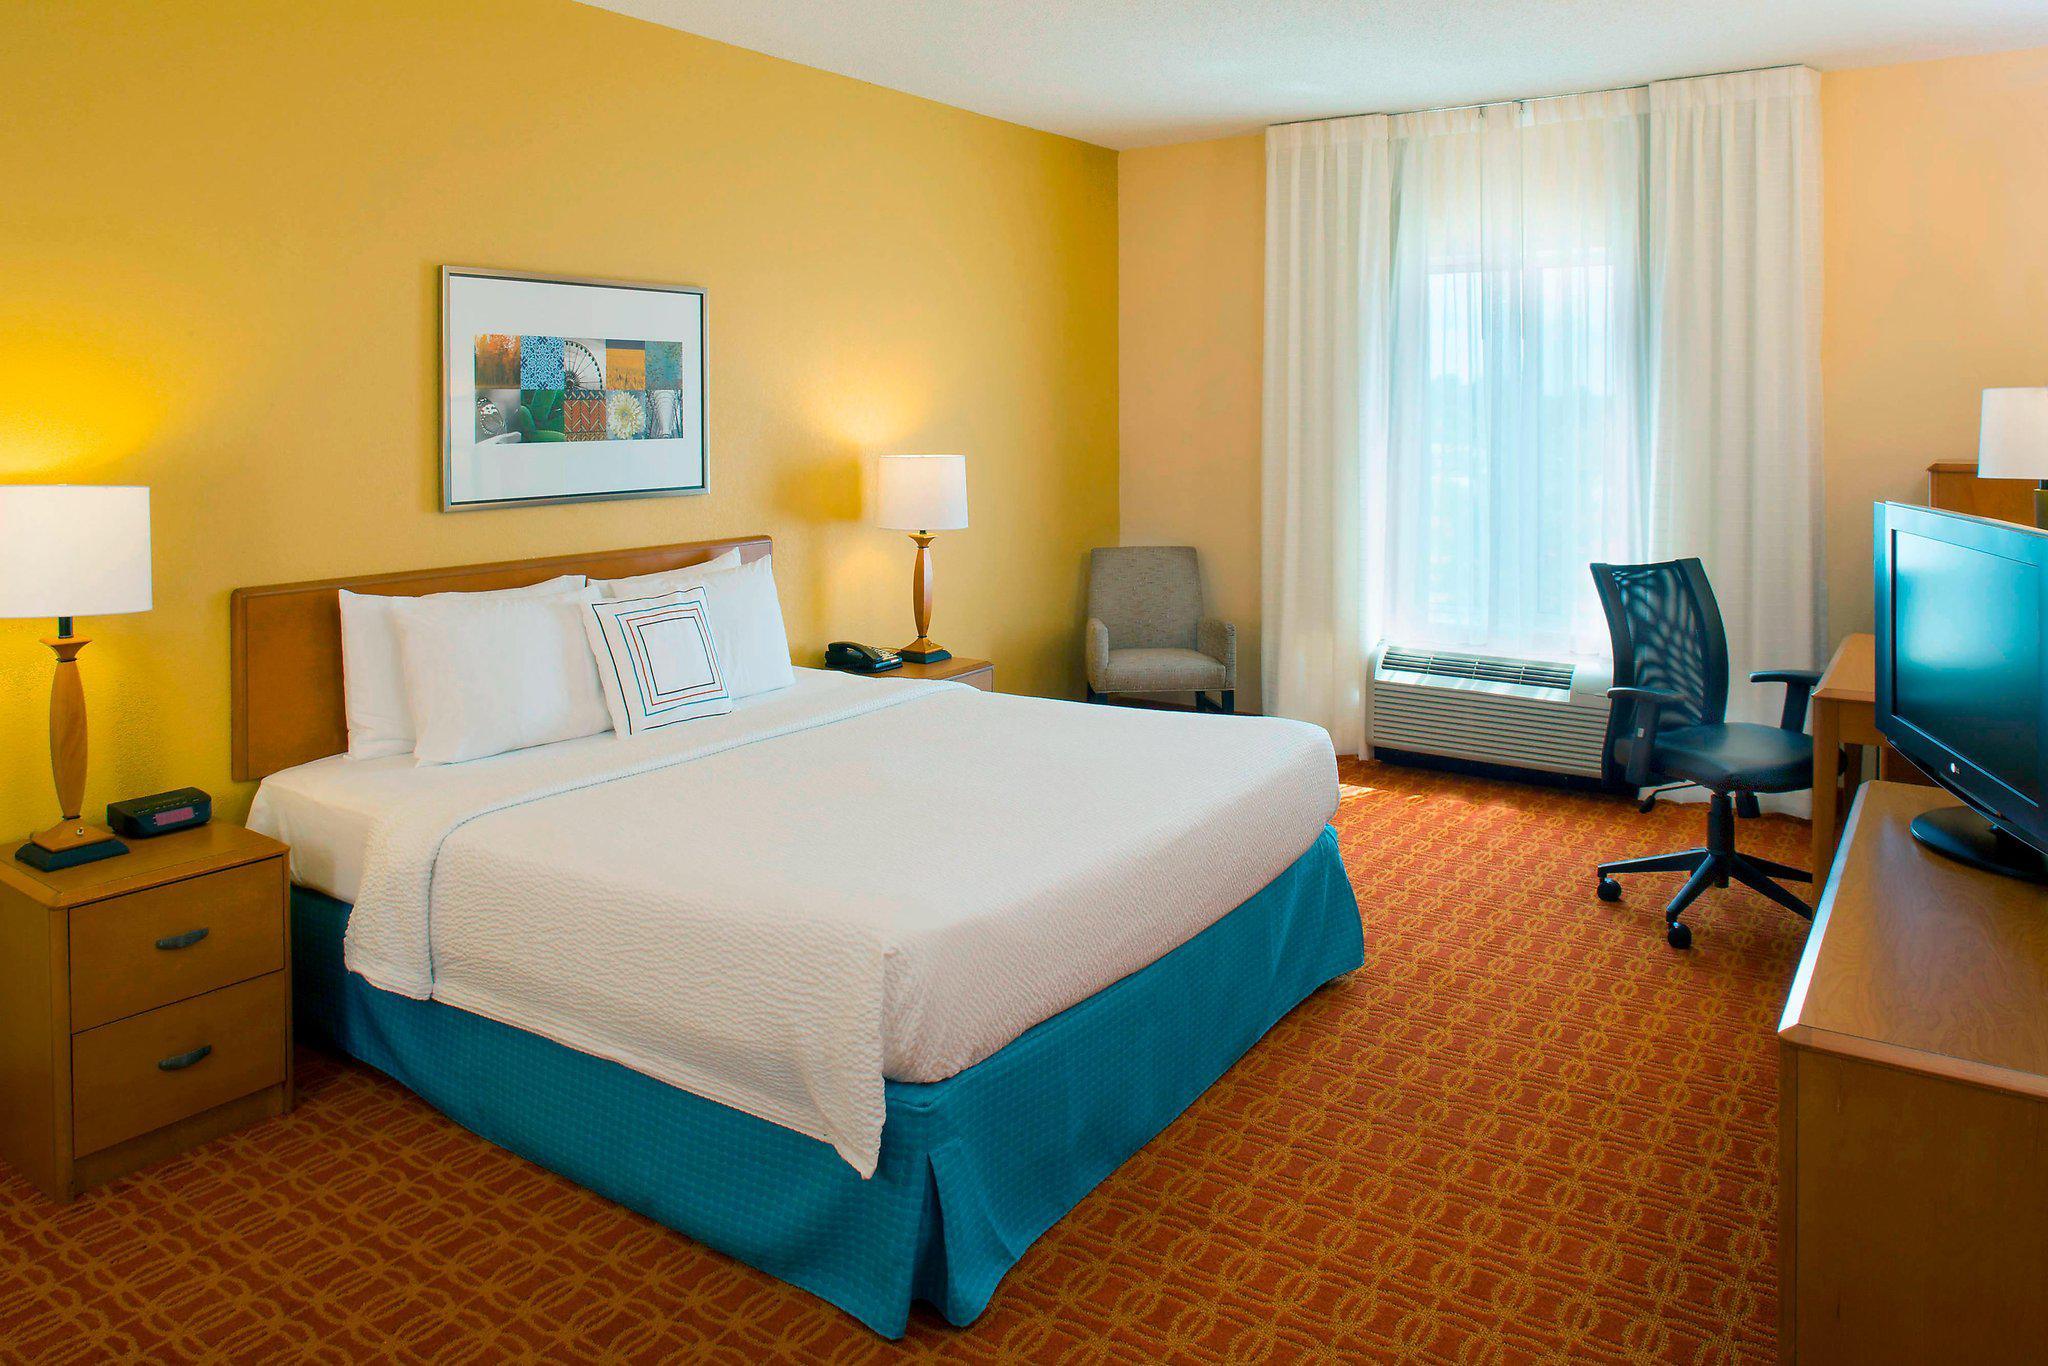 Fairfield Inn & Suites by Marriott Atlanta McDonough